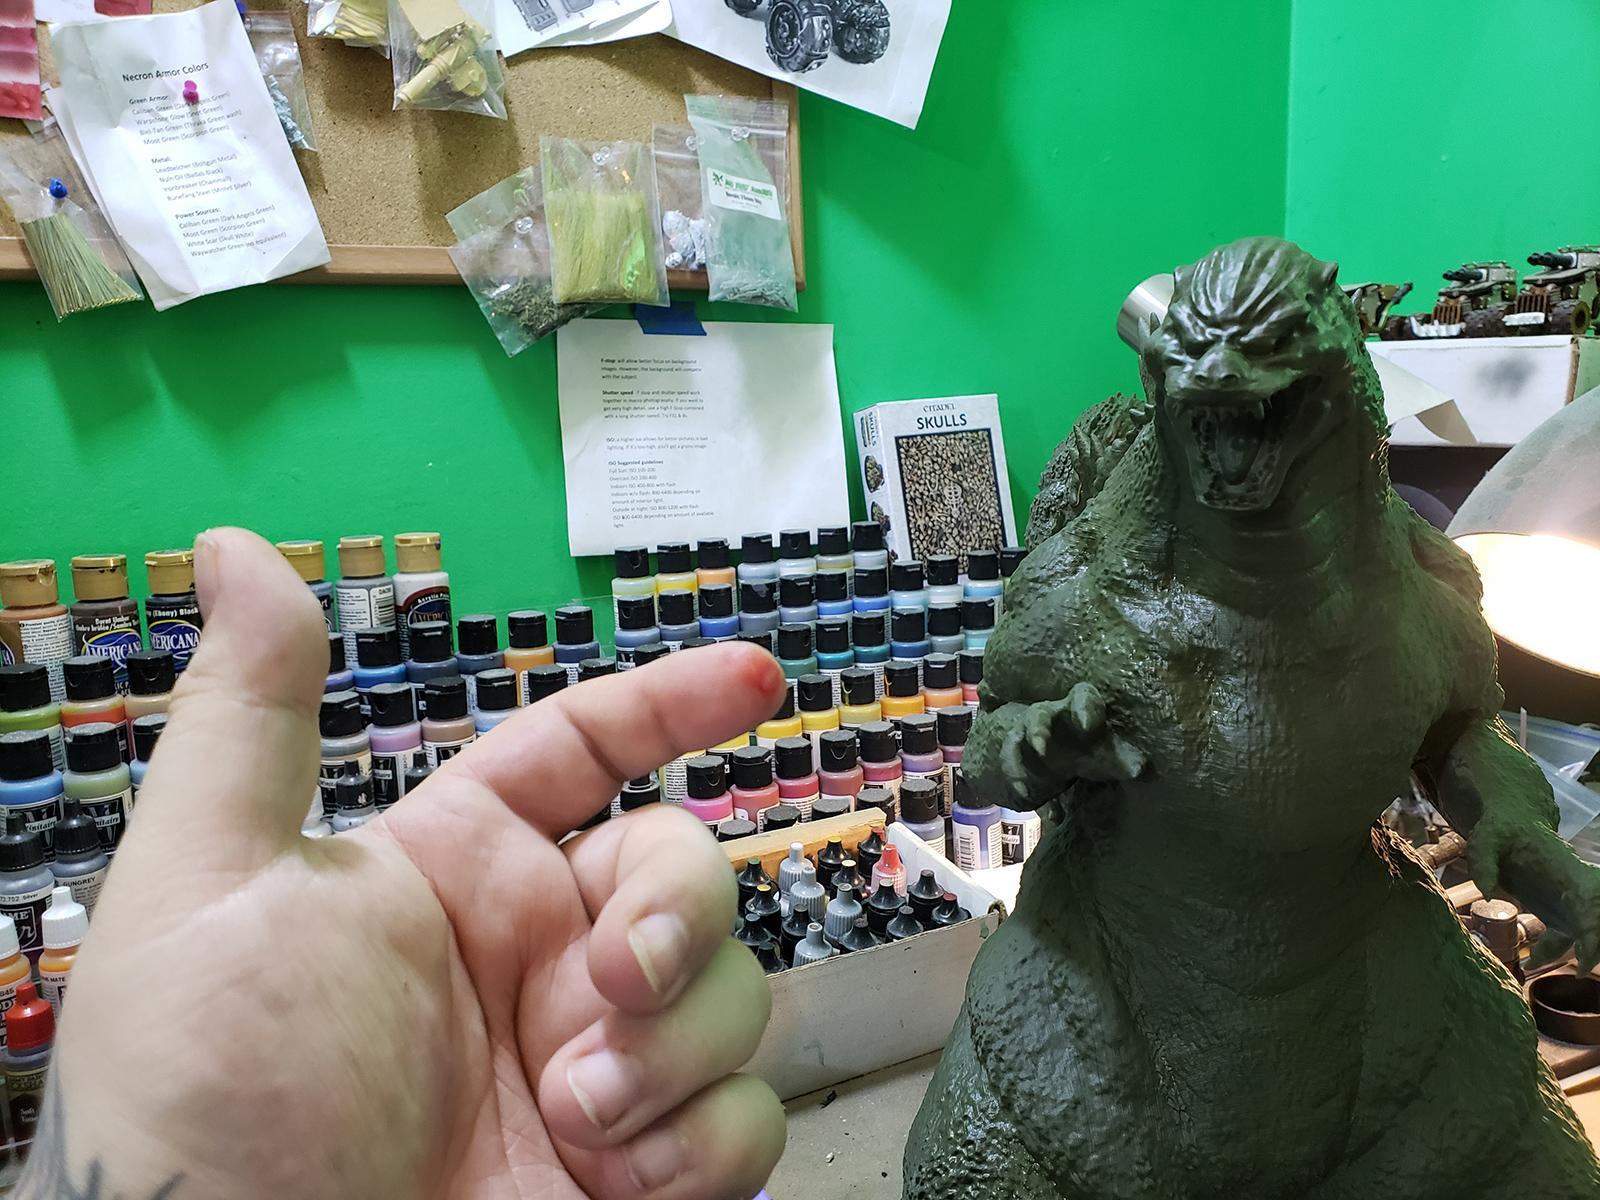 3d Printing, Anycubic I3 Mega, Anycubic Photon, Dlp, Fdm, Gambody, Godzilla, Godzilla Heisei, Heisei, Large